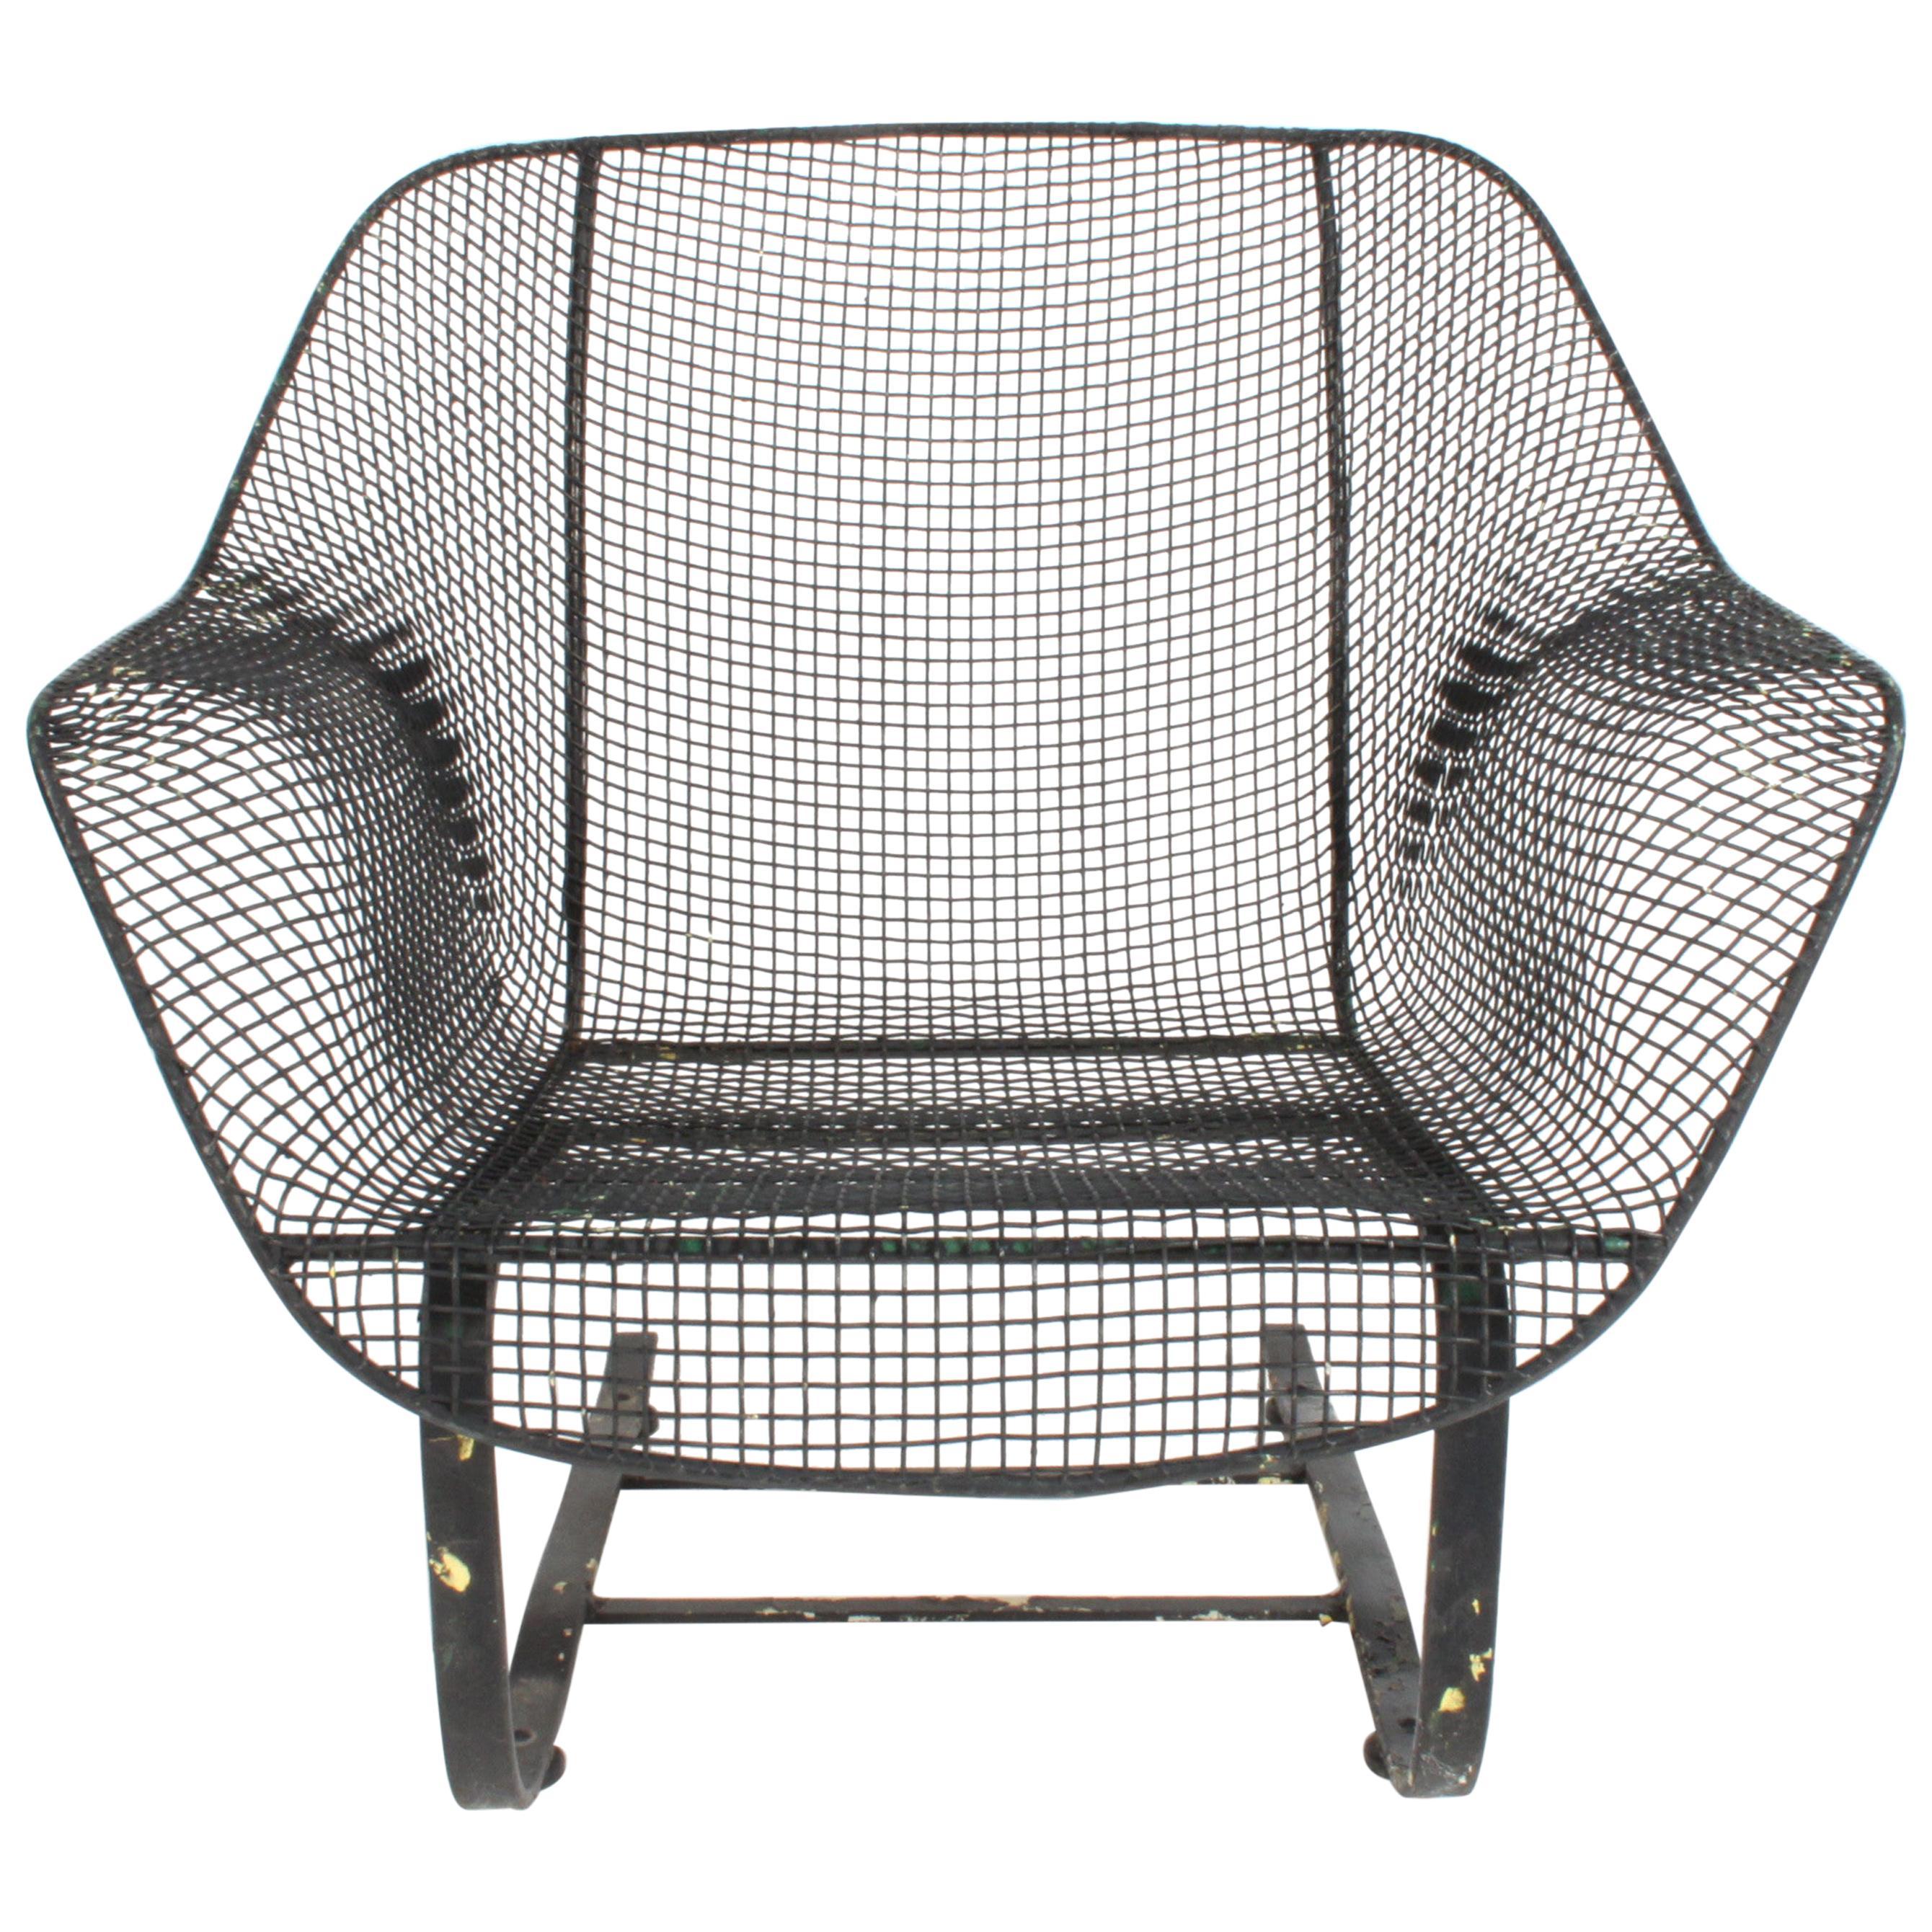 MCM Russell Woodard Sculptura Springer Low Wide Lounge Chair, Restored